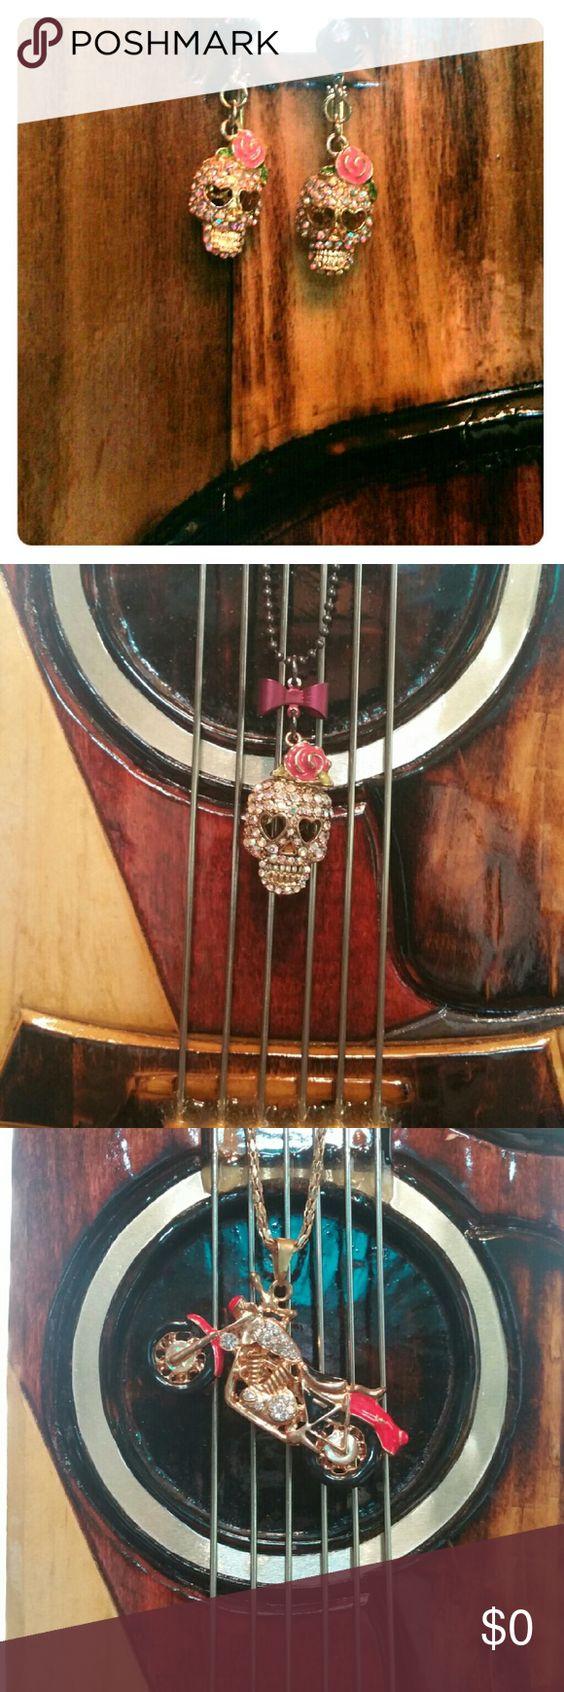 NWOT Betsey Johnson Sugar Skull earrings Super cute, sparkle skull with pink rose. Betsey Johnson Jewelry Earrings